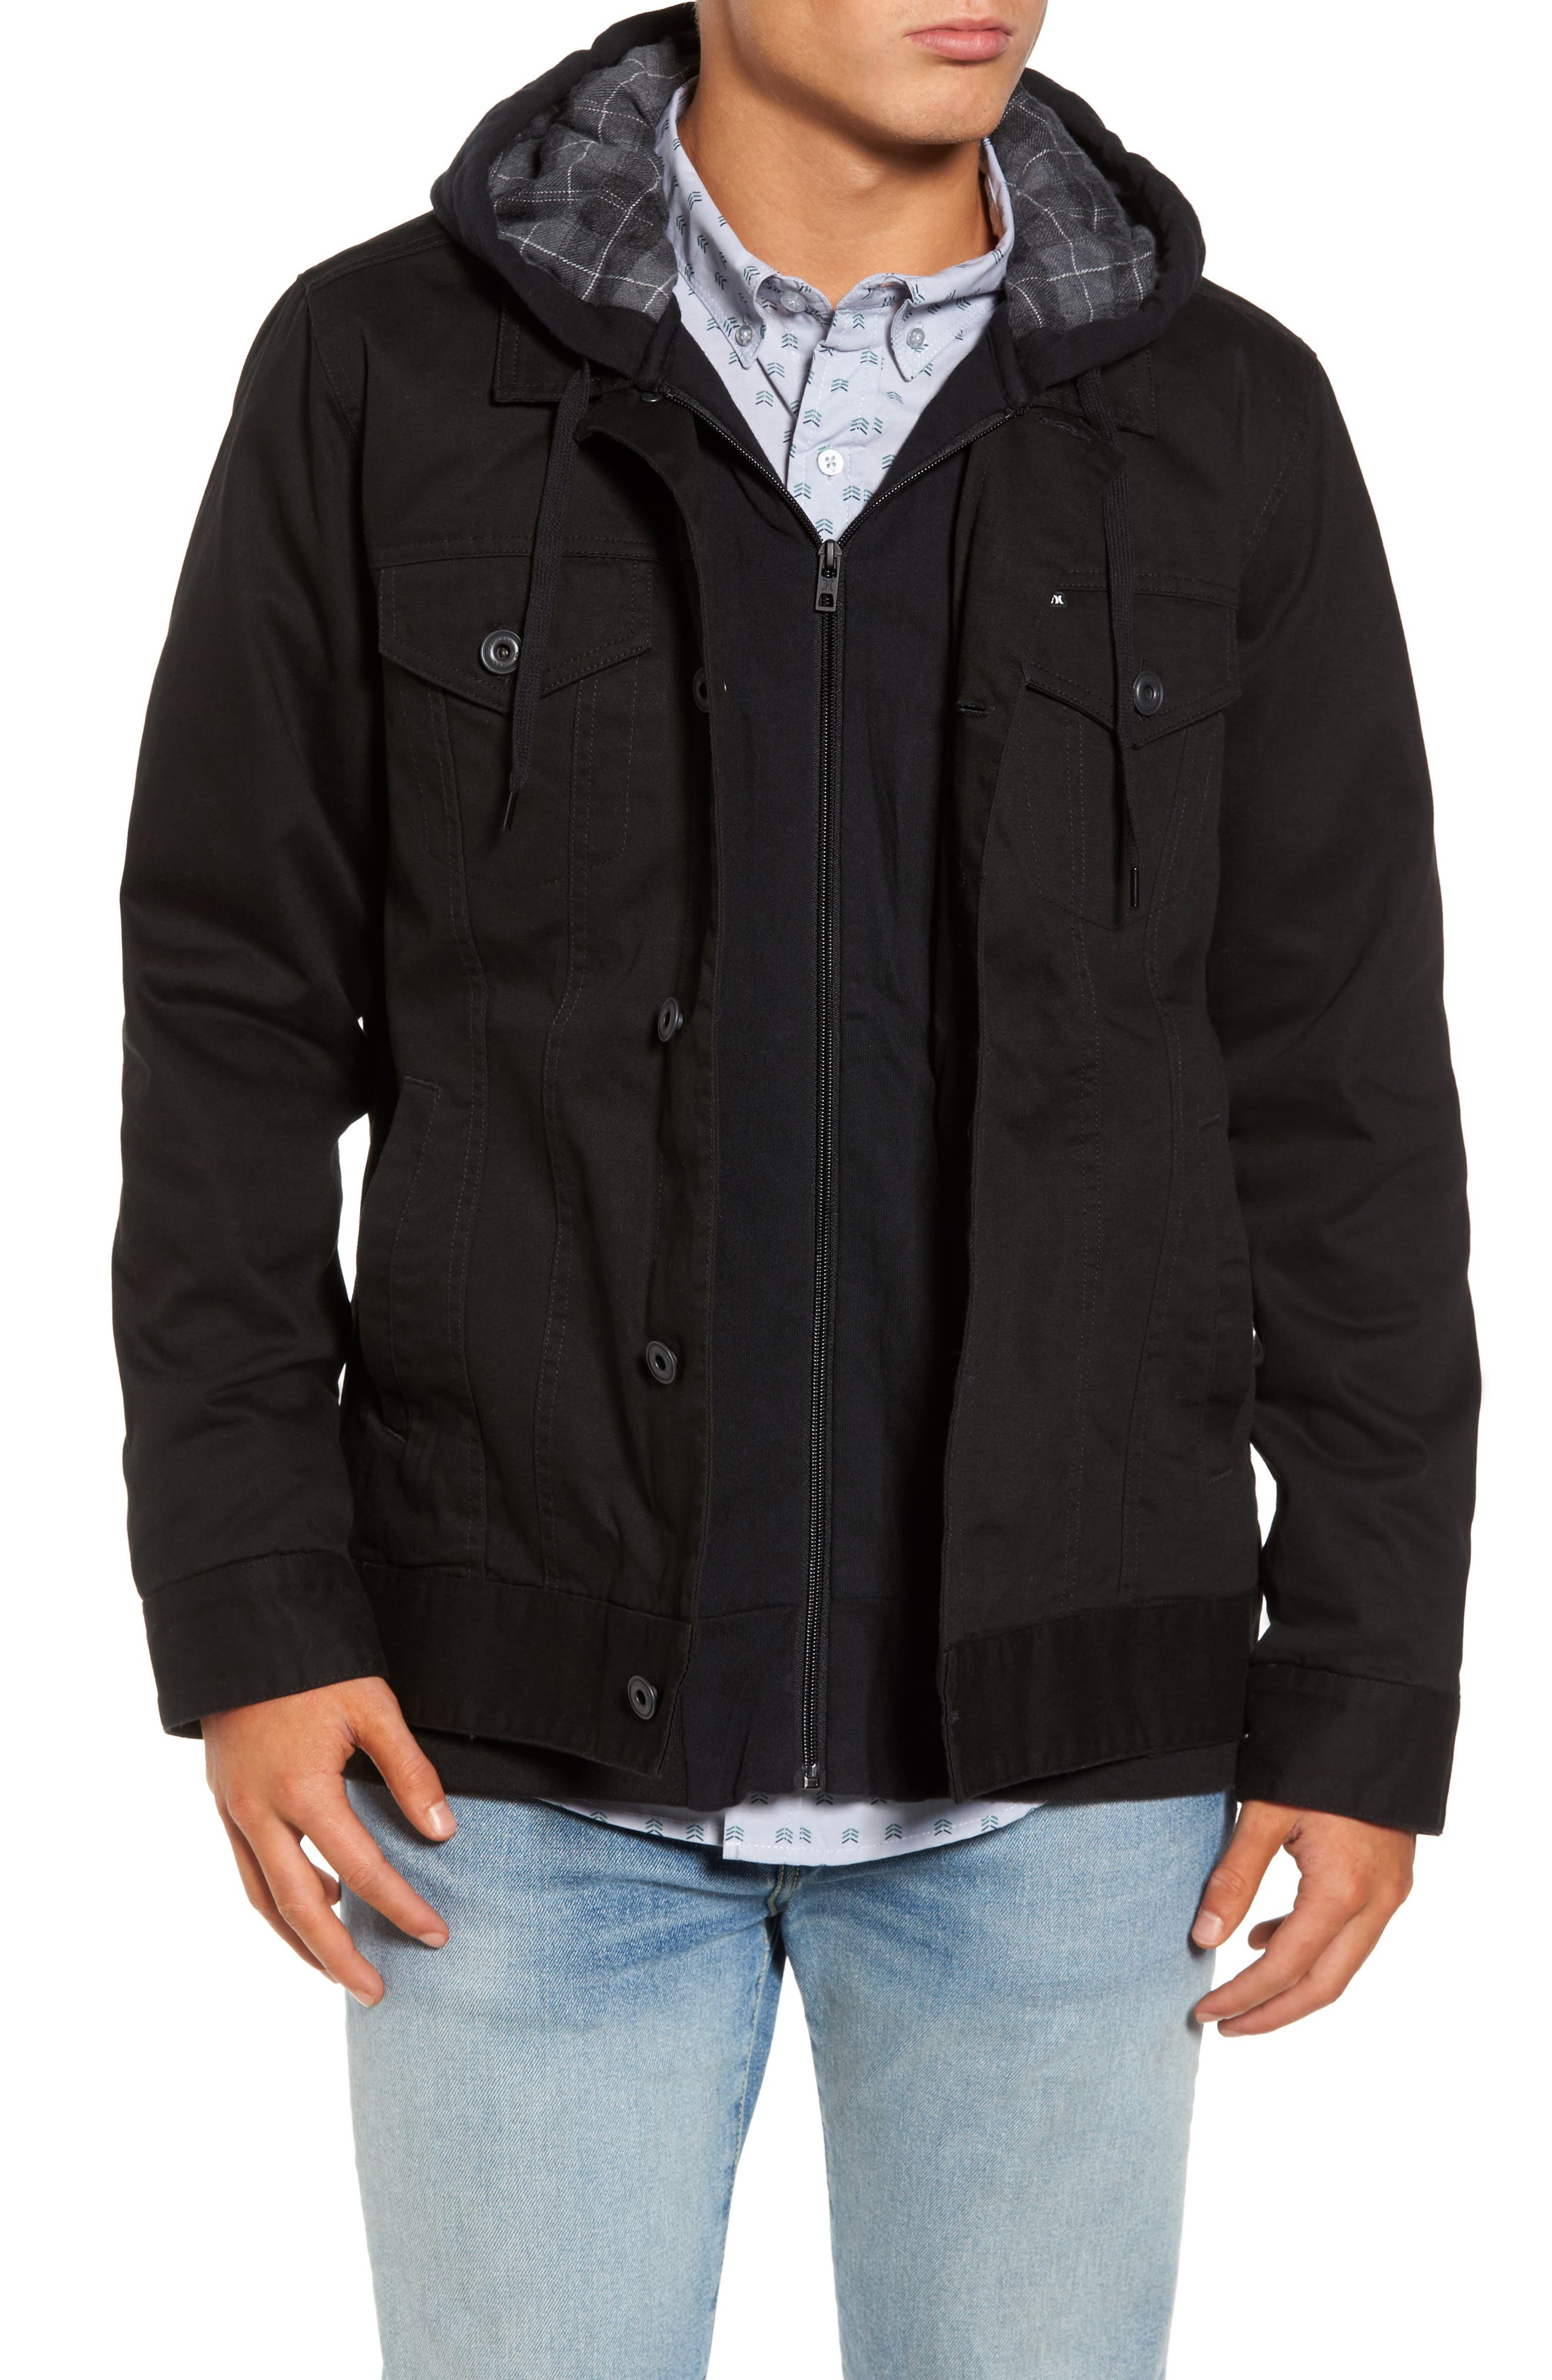 Mac Trucker 3.0 Hooded Jacket,                         Main,                         color, 010